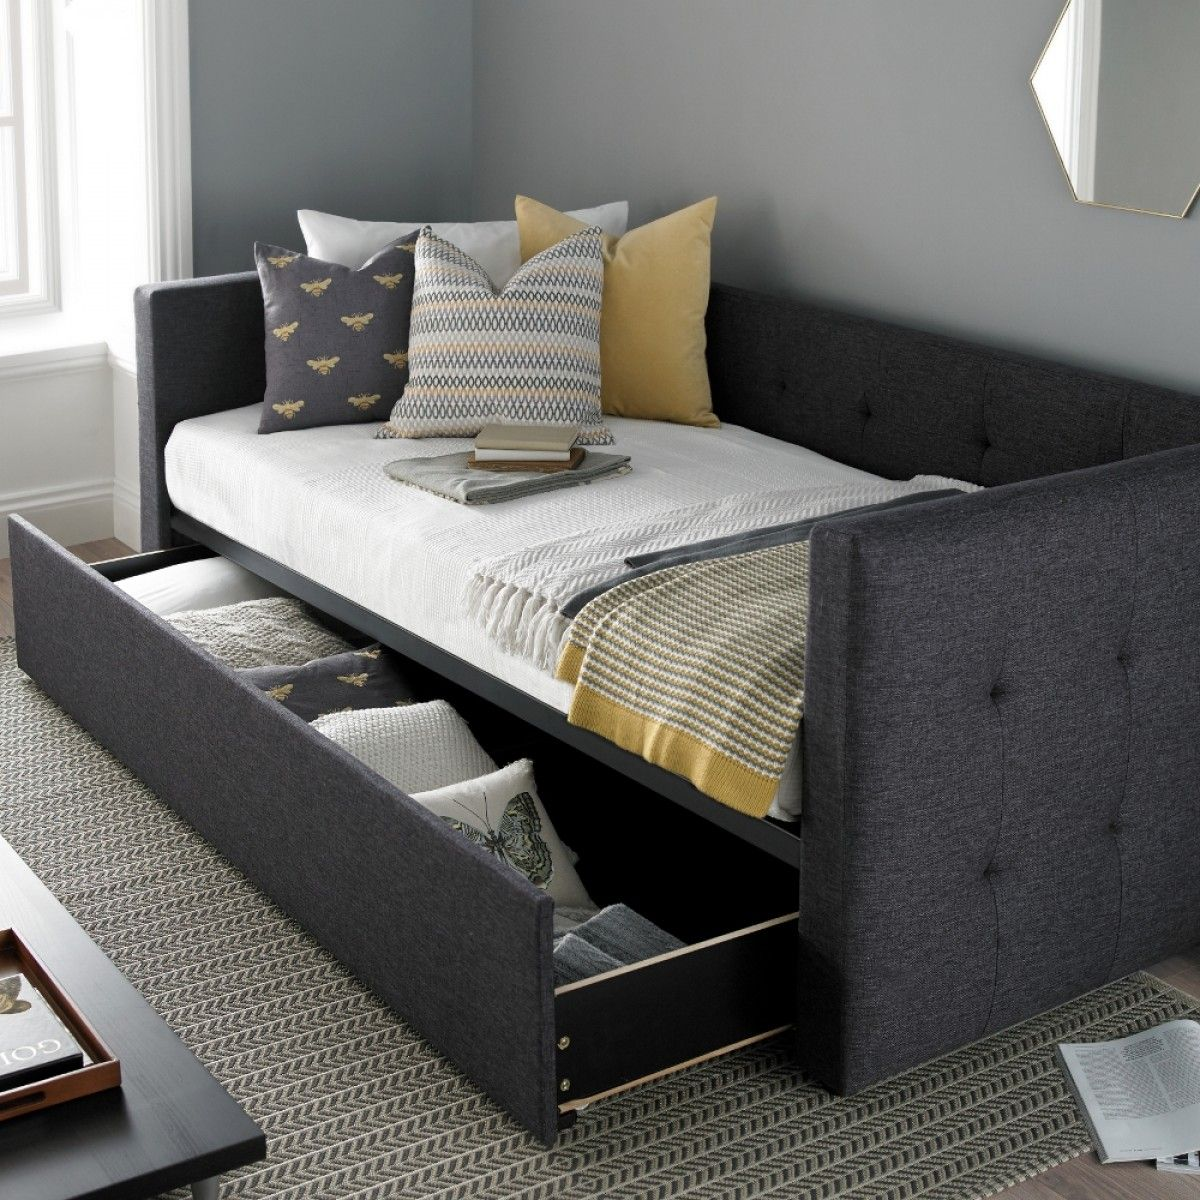 - Frankie Grey Fabric Guest Bed Dekorasyon Fikirleri, Ev